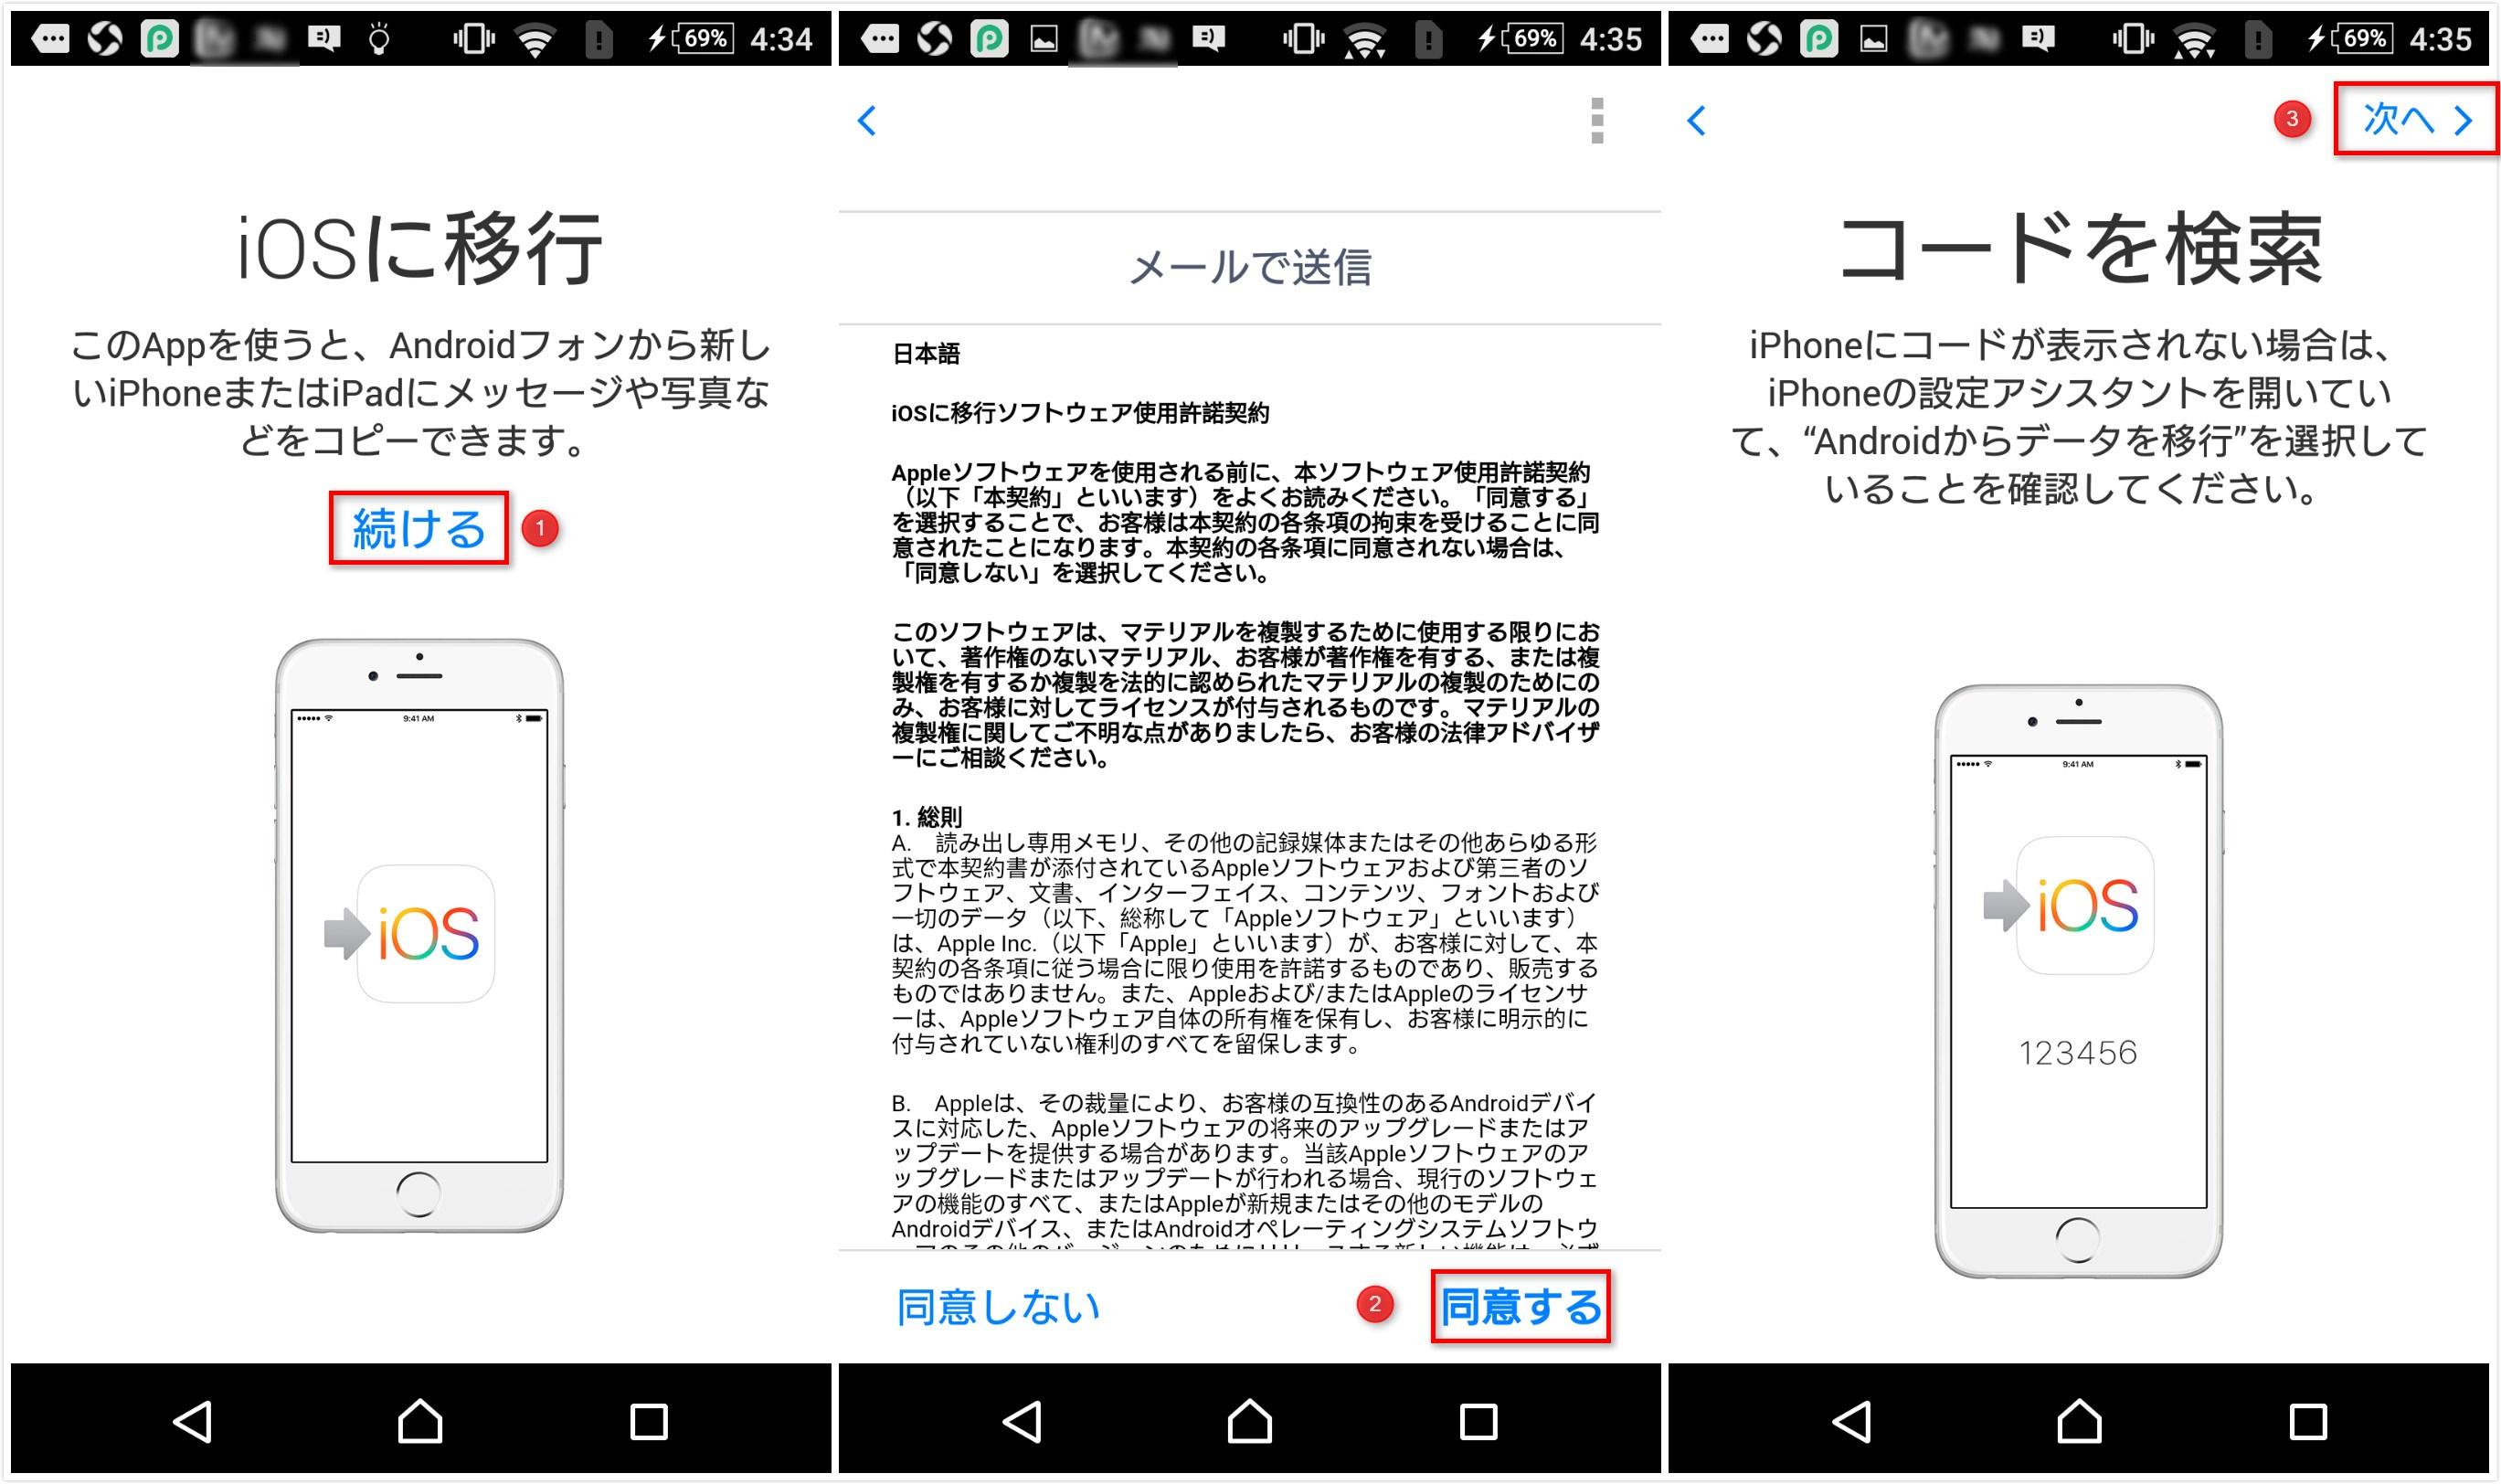 「Move to iOS」でauのアンドロイドからiPhoneにデータを移行する